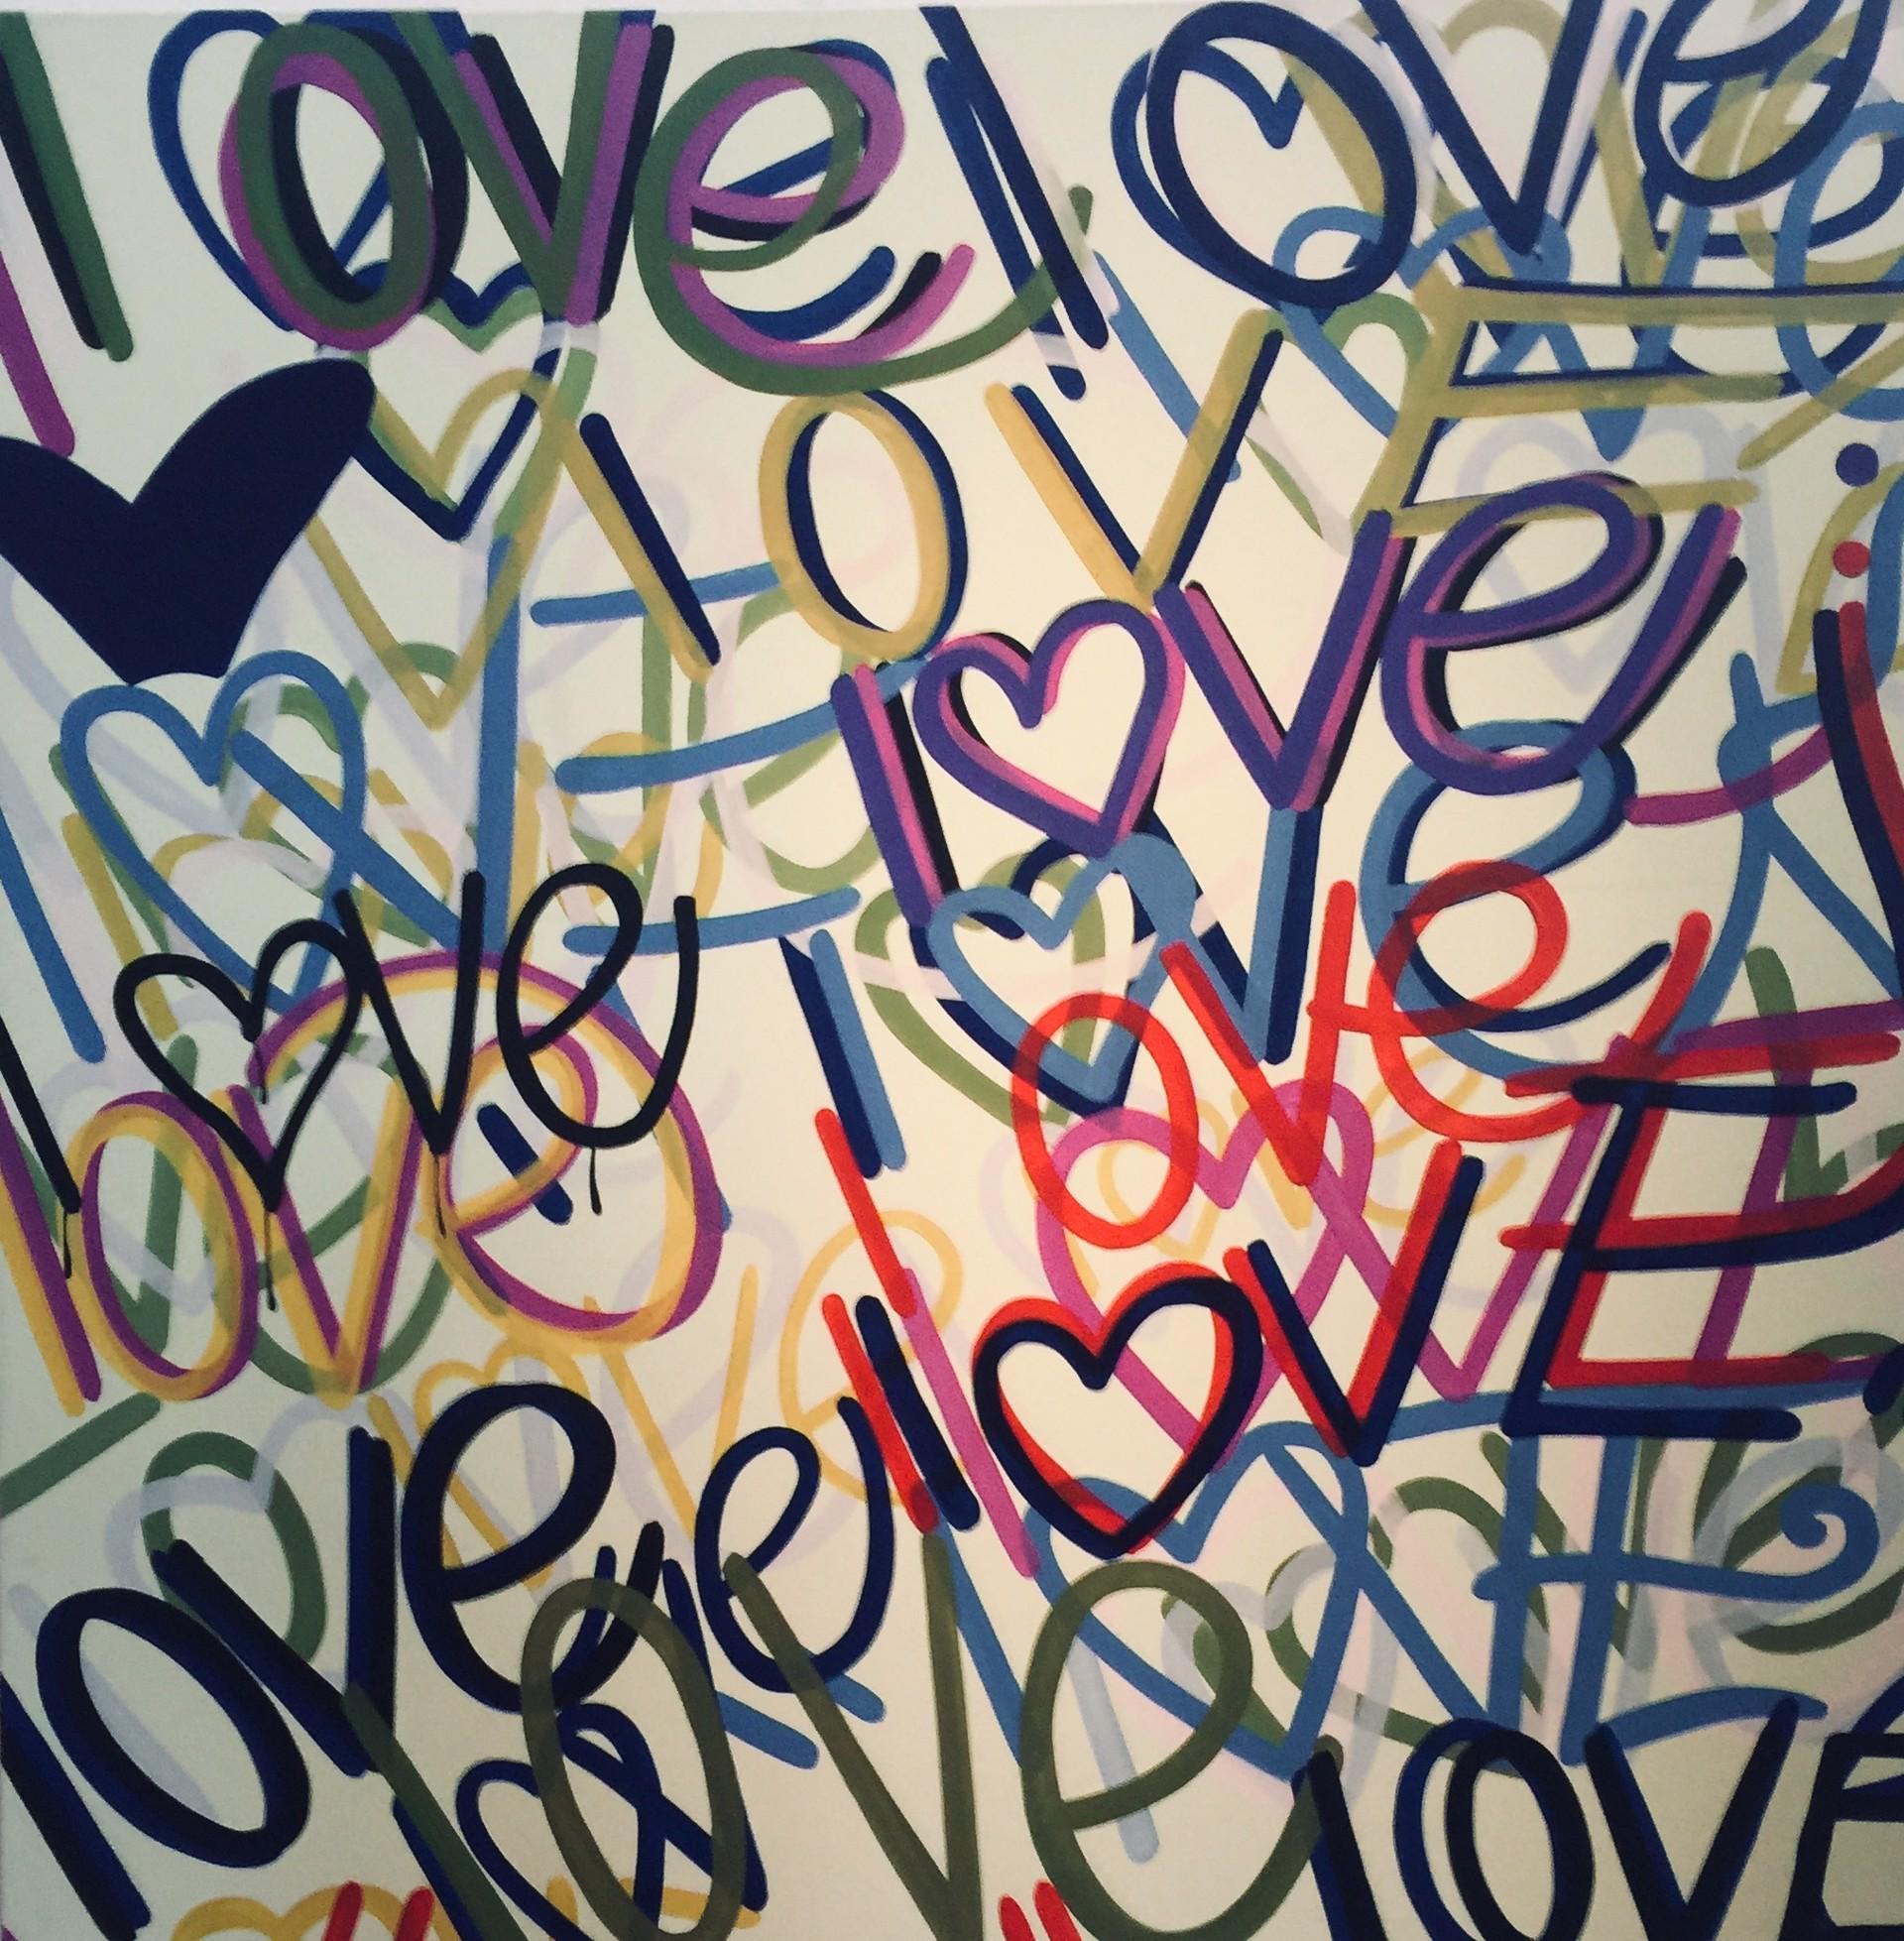 """Love, Love,Love"" by Buma Project"